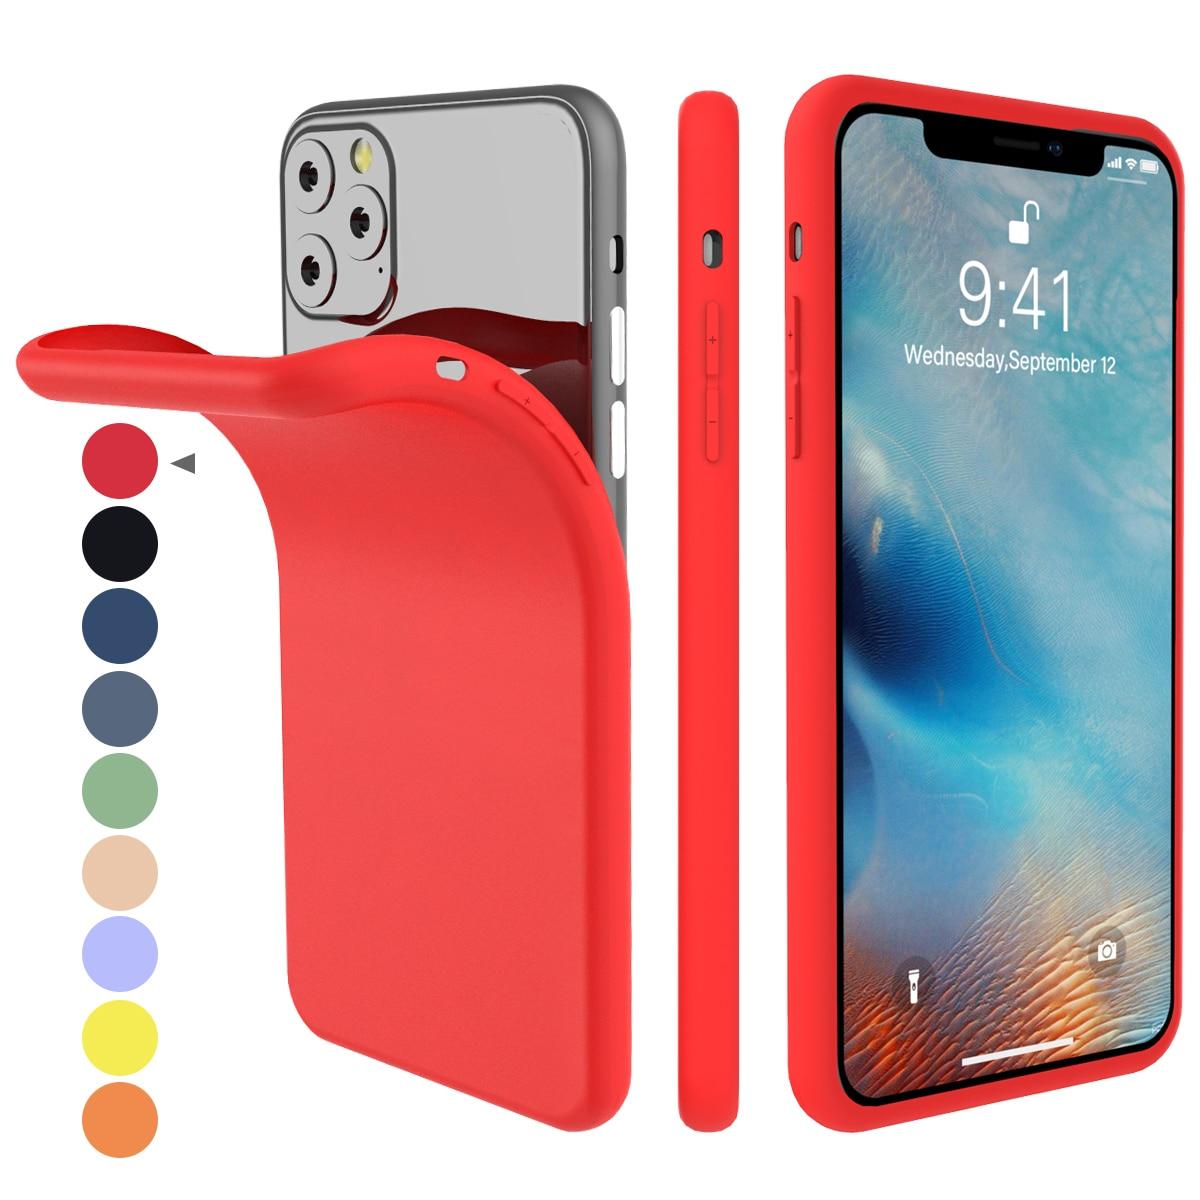 Torubia Silicone Case for iPhone 11/11 Pro/11 Pro Max 36